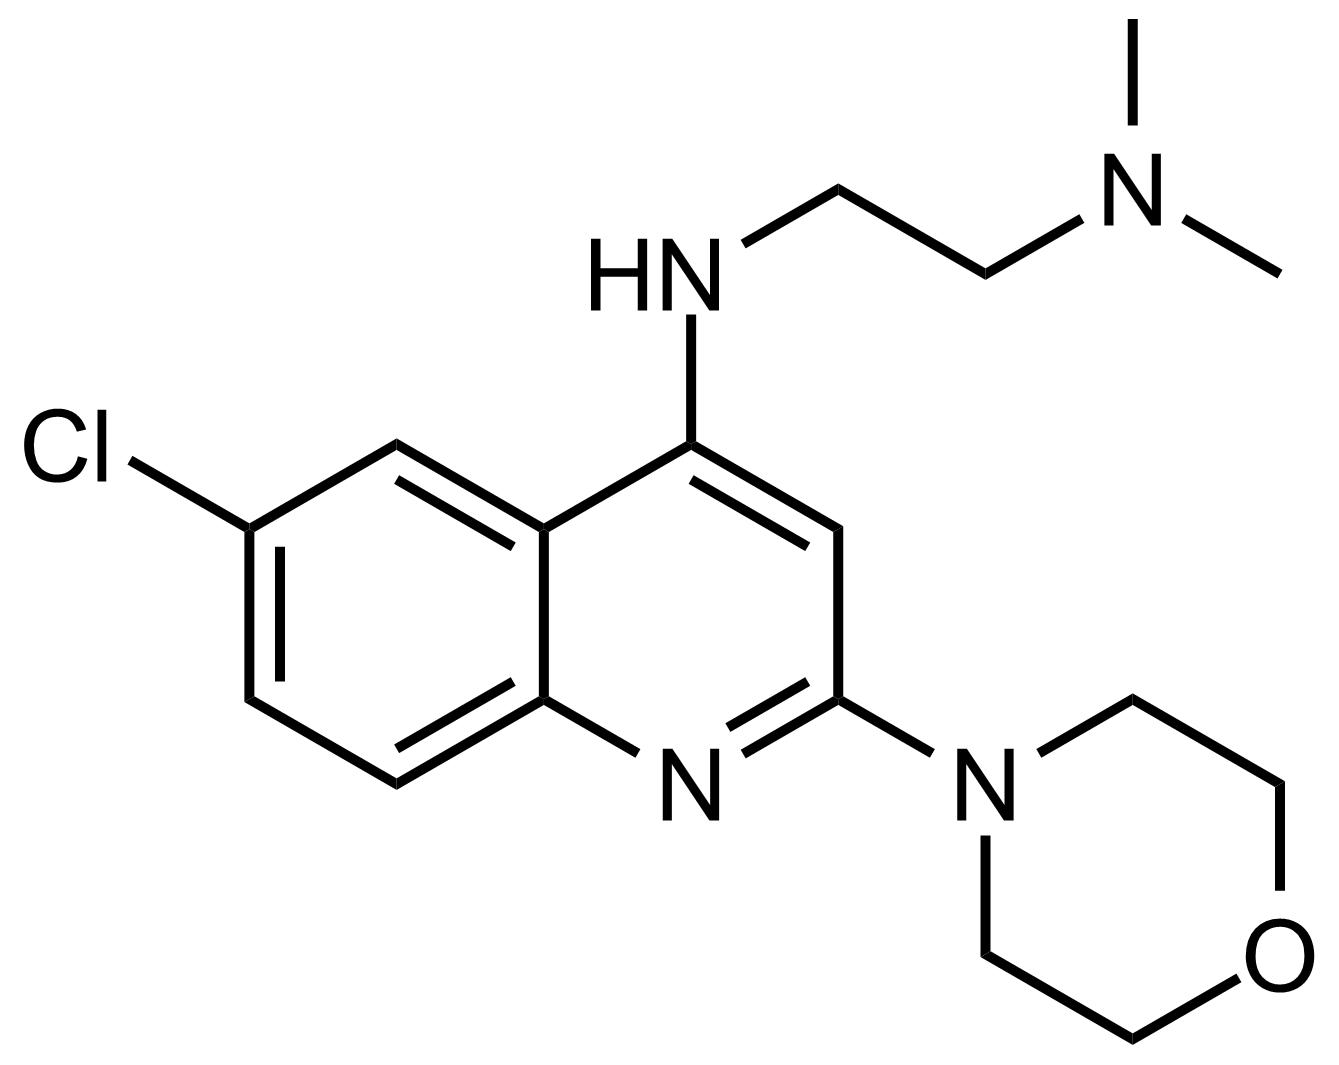 Structure of N'-(6-Chloro-2-morpholinoquinolin-4-yl)-N,N-dimethylethane-1,2-diamine